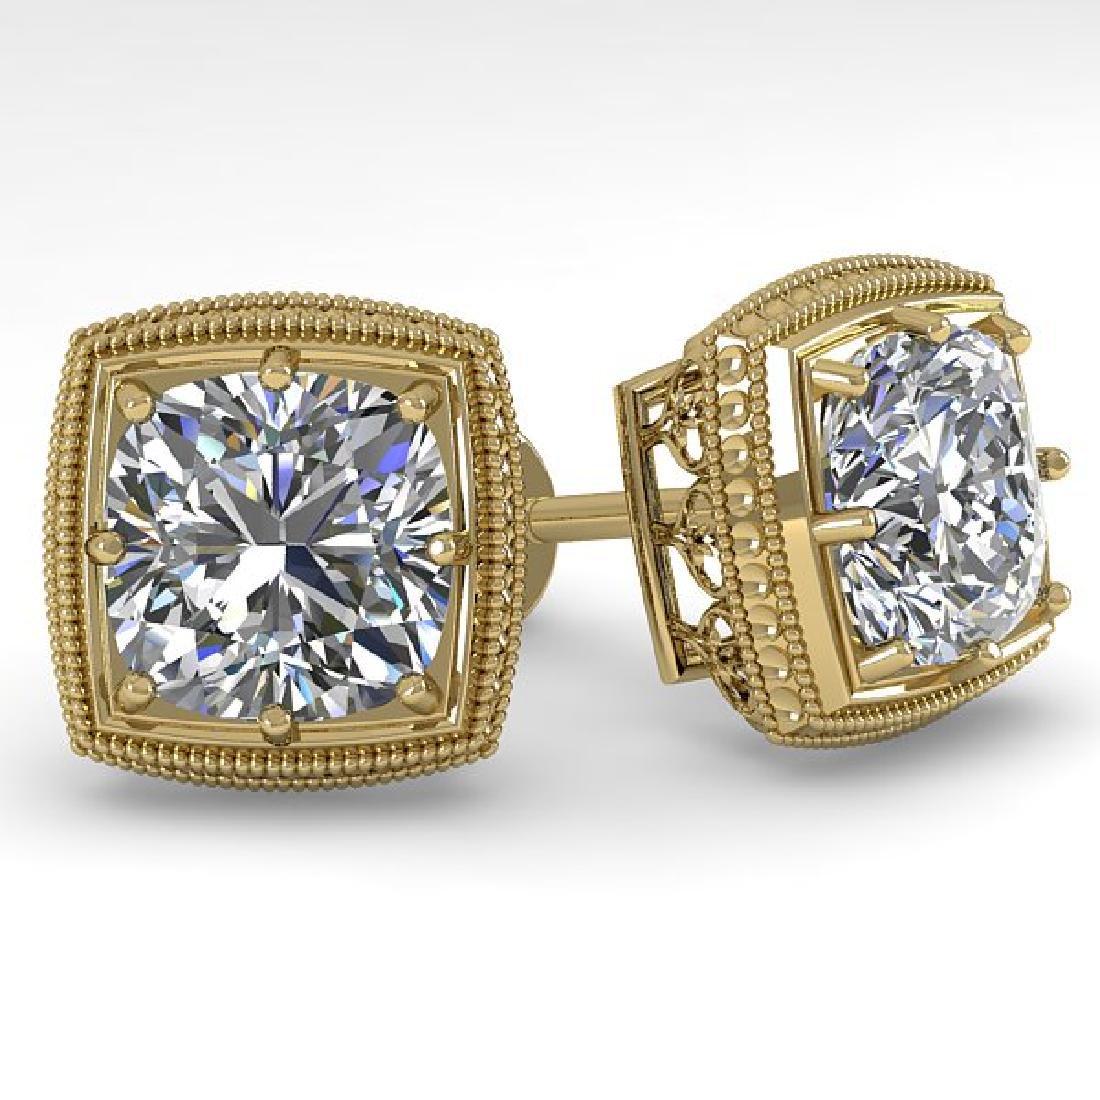 2 CTW VS/SI Cushion Cut Diamond Stud Earrings Deco 18K